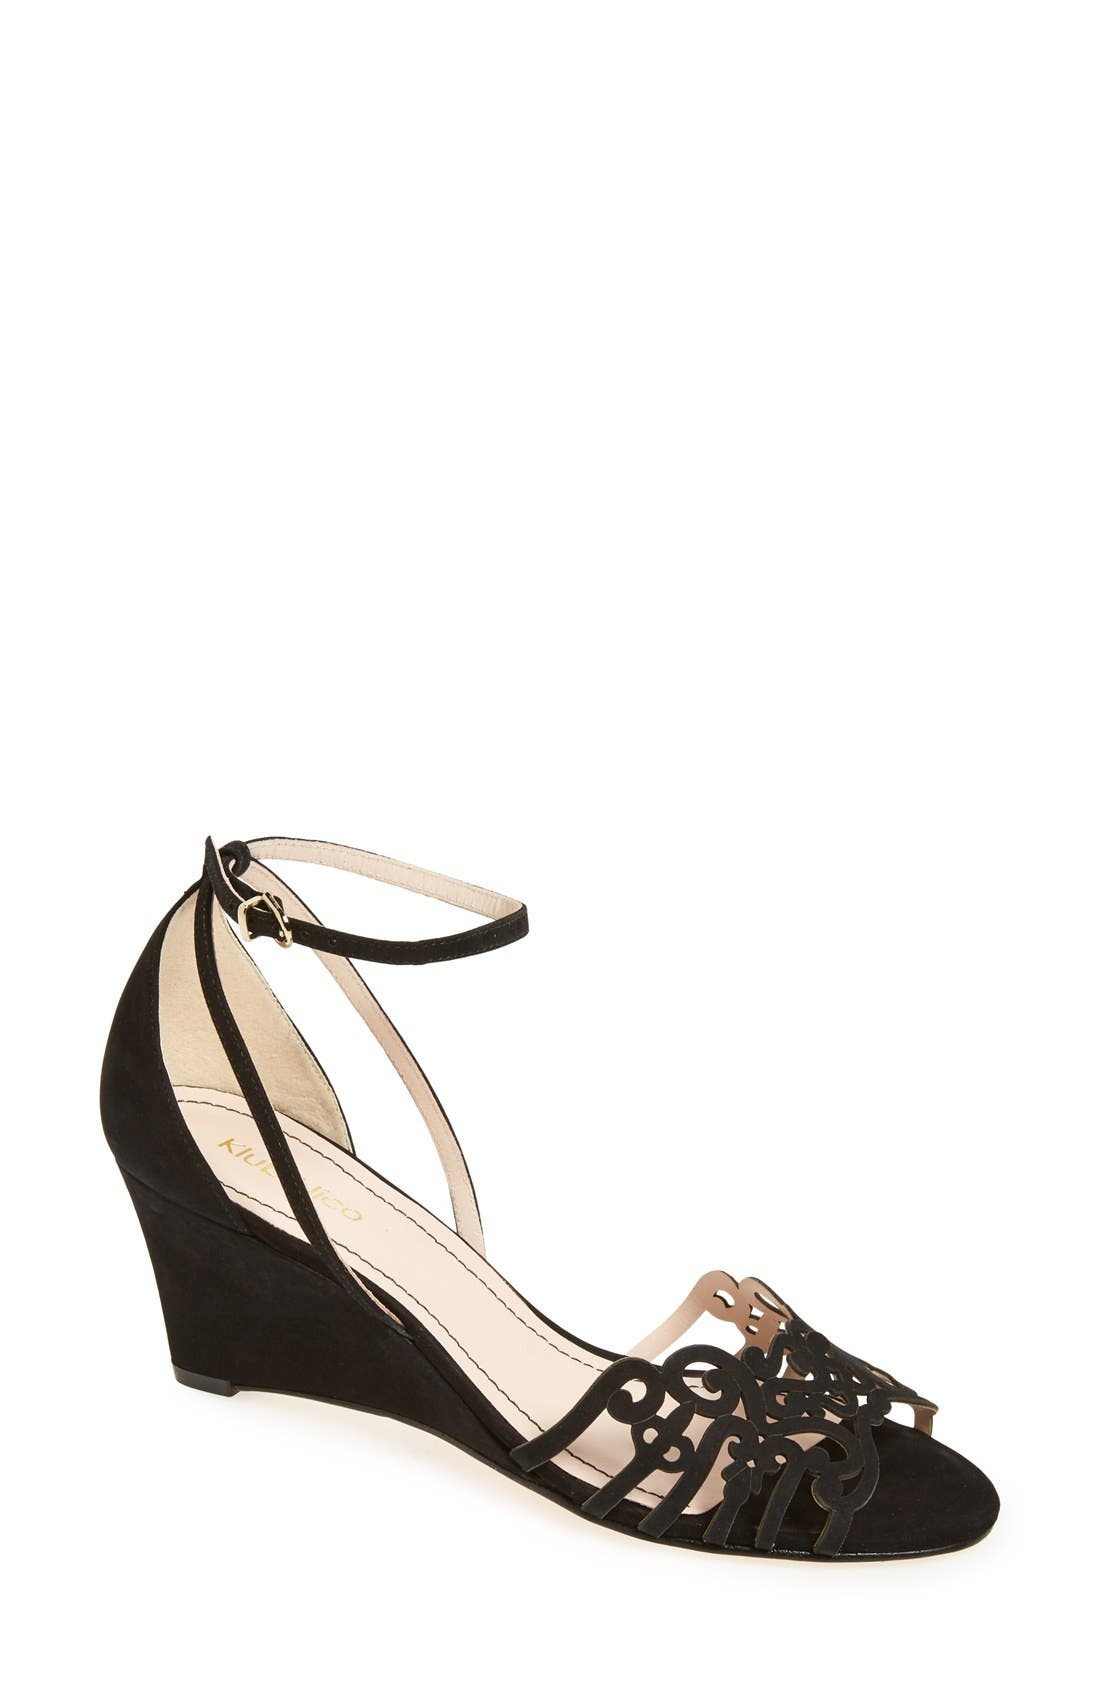 'Kingston' Ankle Strap Wedge Sandal,                         Main,                         color, Black Nubuck Leather